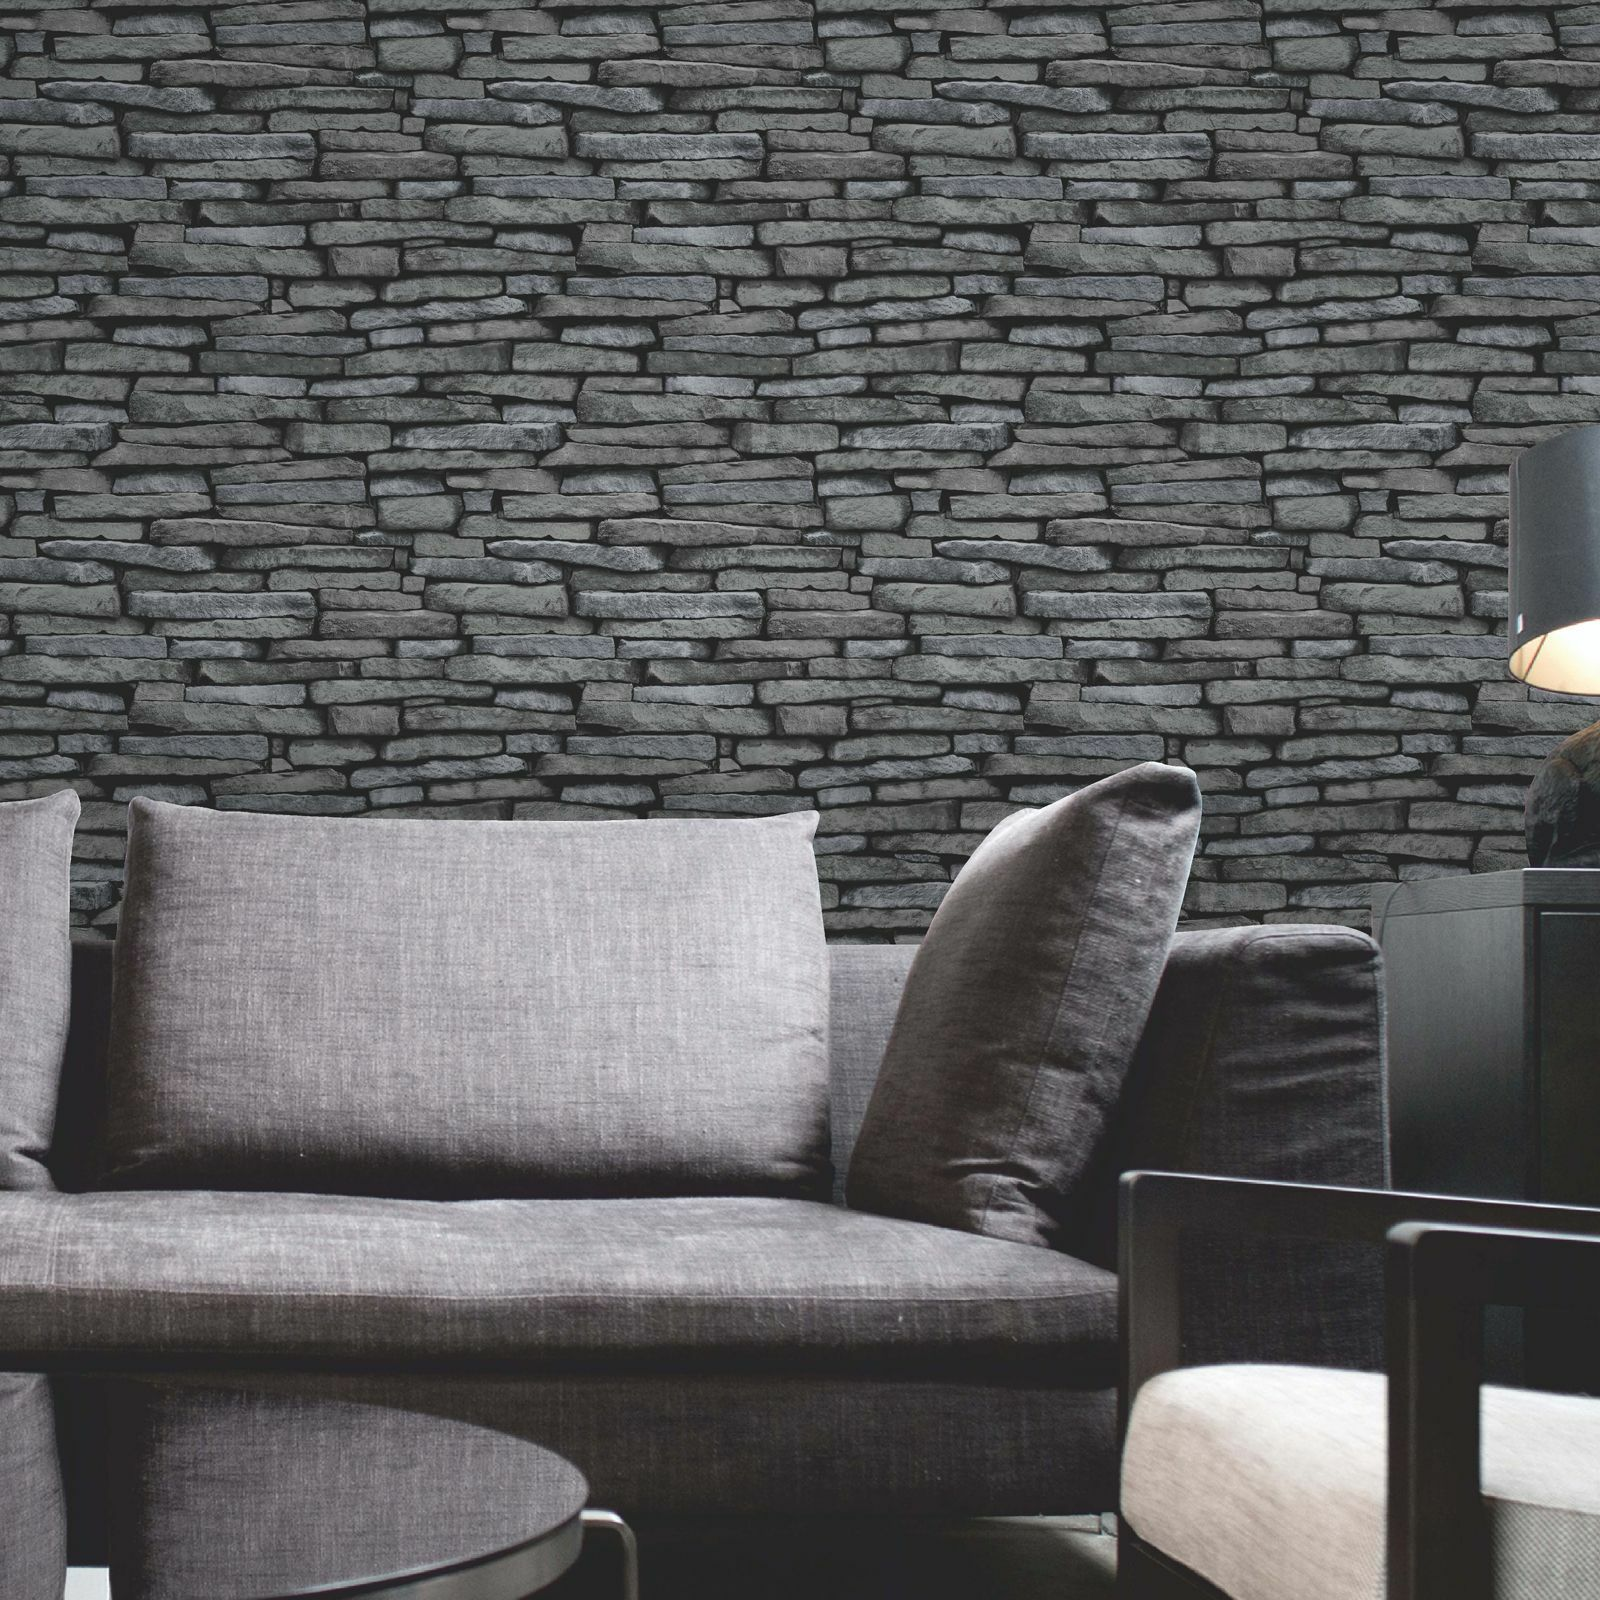 Brick Effect Wallpaper Living Room Ideas 1600x1600 Download Hd Wallpaper Wallpapertip